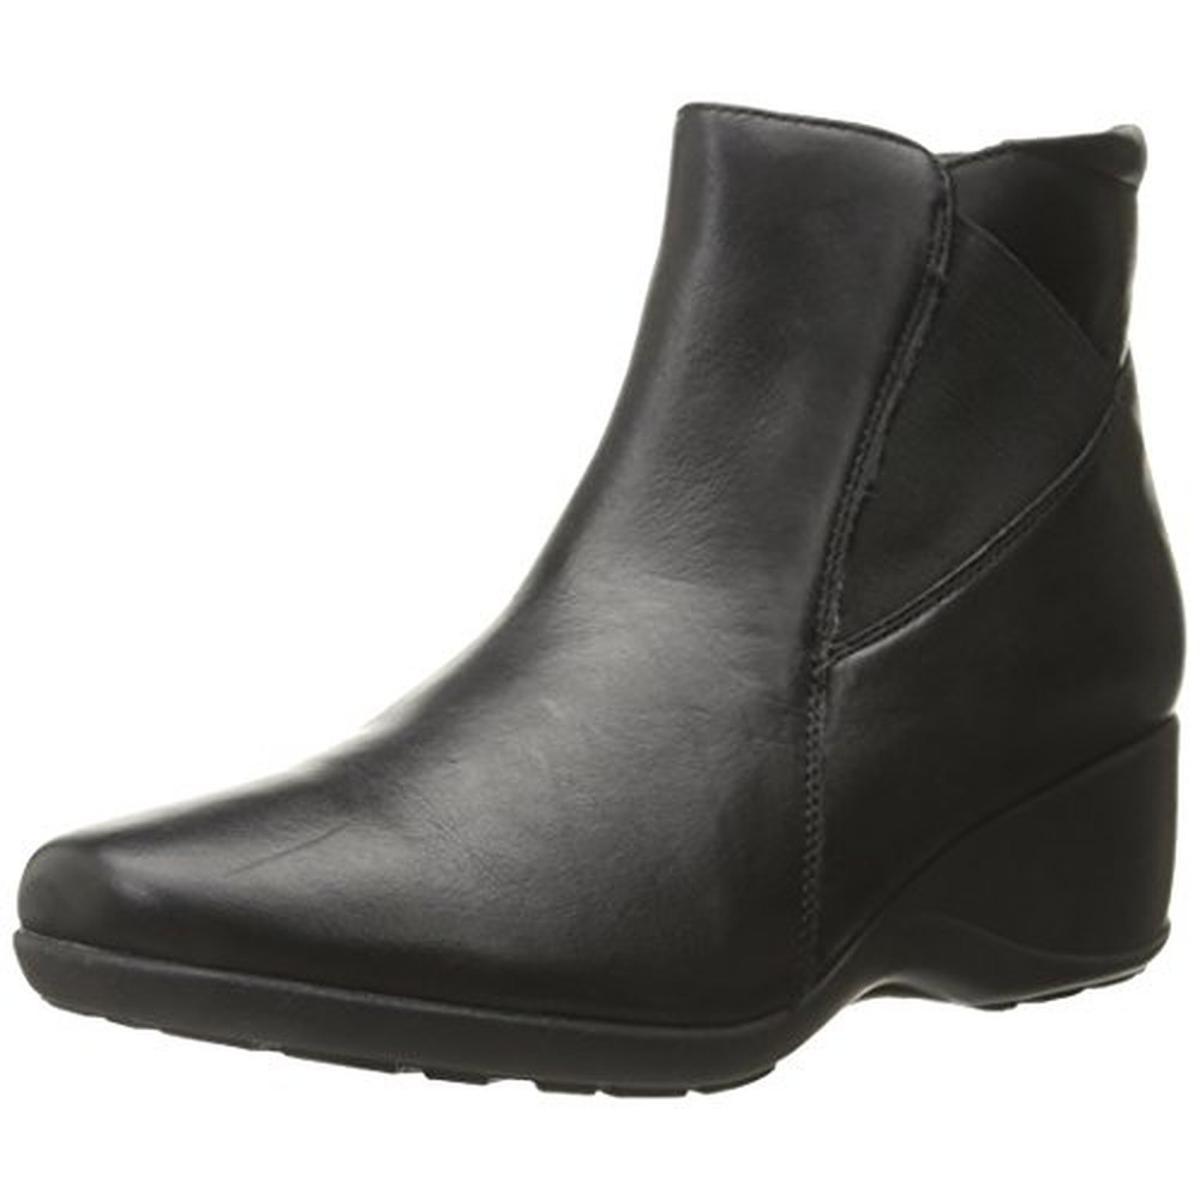 4617c69eaffcf Details about Clarks Womens Allura Mystic Black Chelsea Boots Shoes 9  Medium (B,M) BHFO 7156